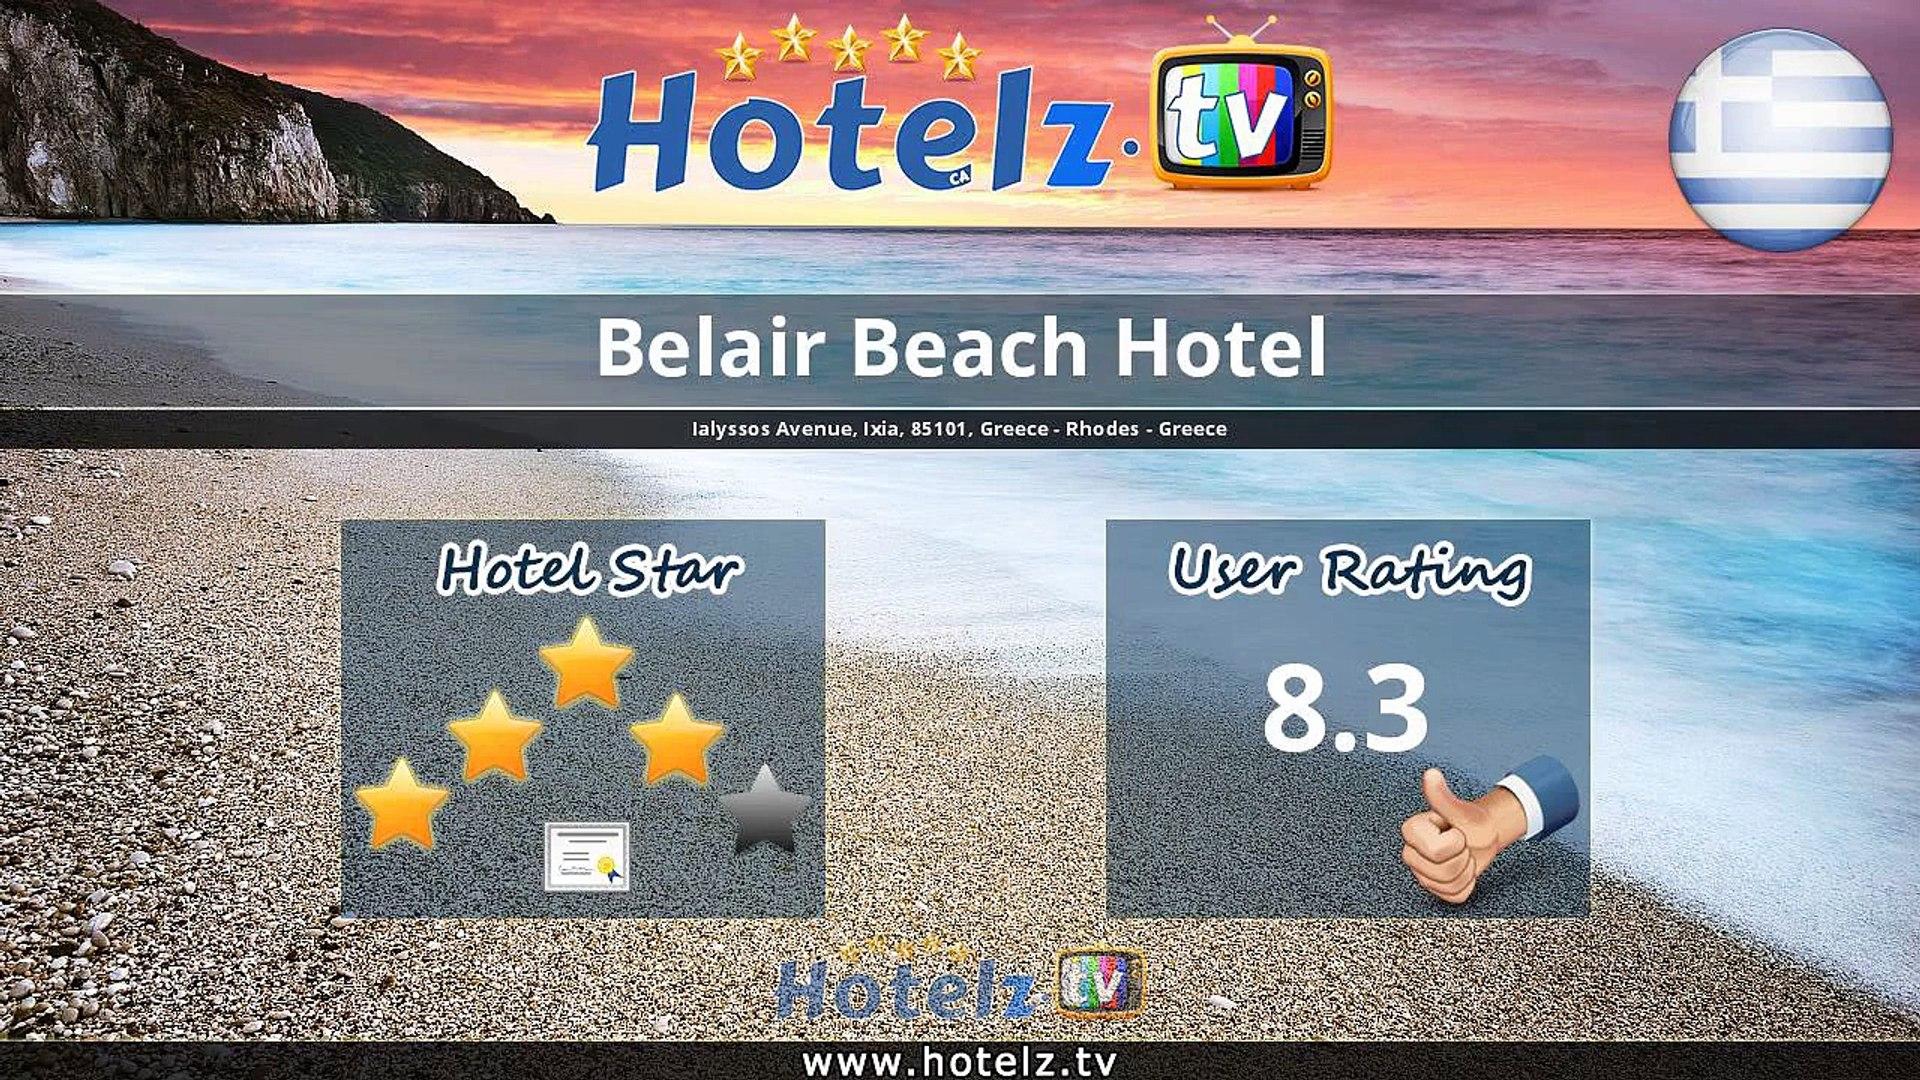 Belair Beach Hotel - Ixia - Greece